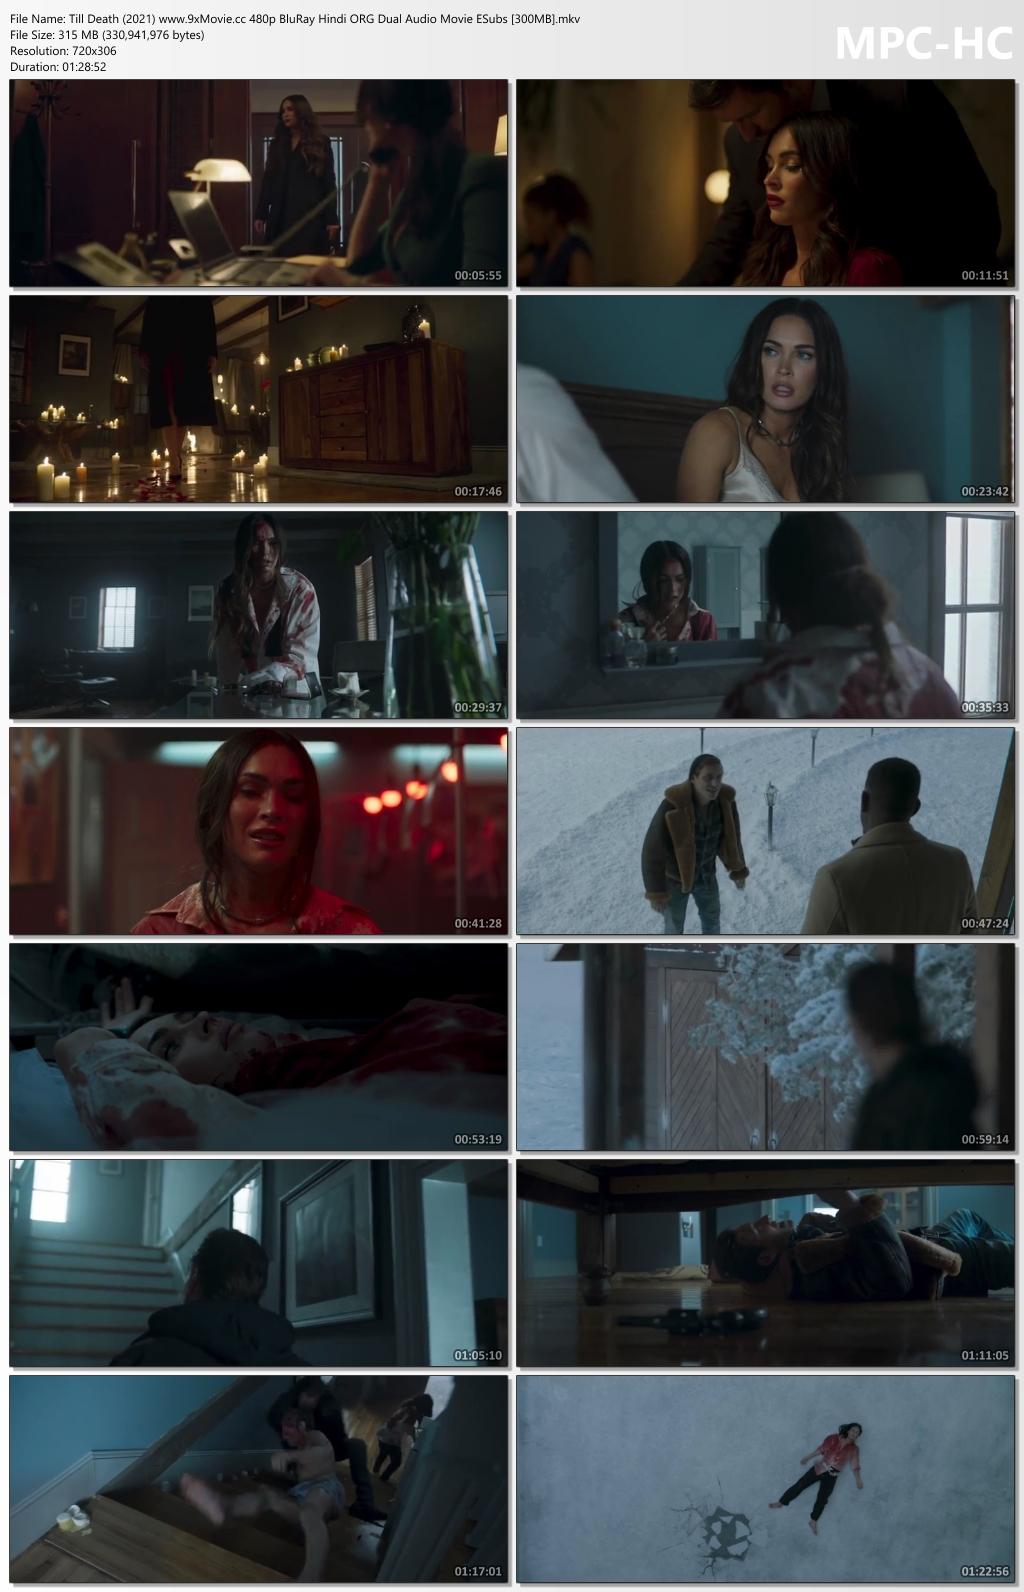 Till-Death-2021-www-9x-Movie-cc-480p-Blu-Ray-Hindi-ORG-Dual-Audio-Movie-ESubs-300-MB-mkv